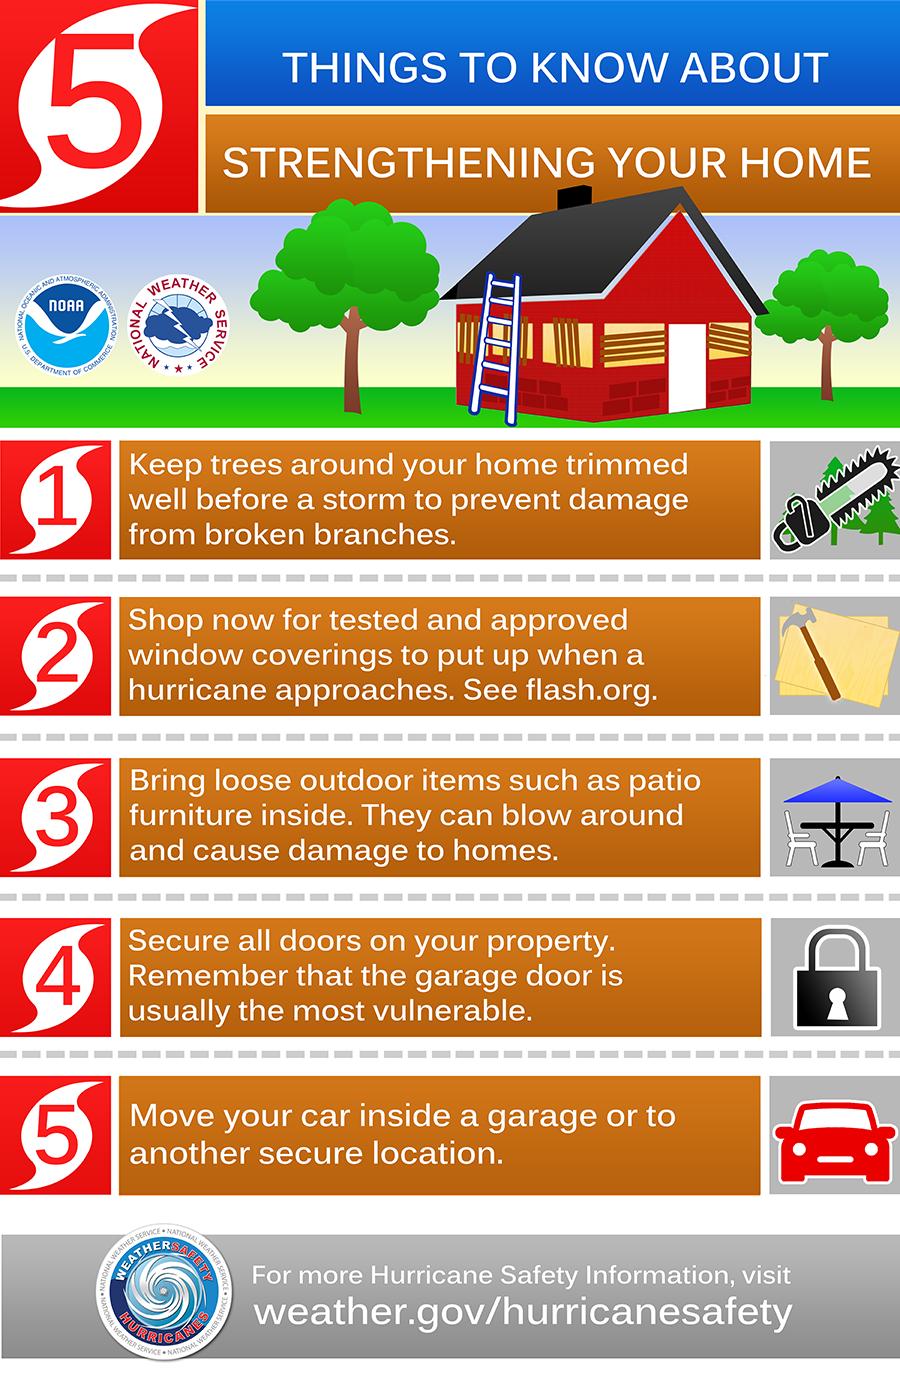 Hurricane preparedness week, day 5, strengthen your home